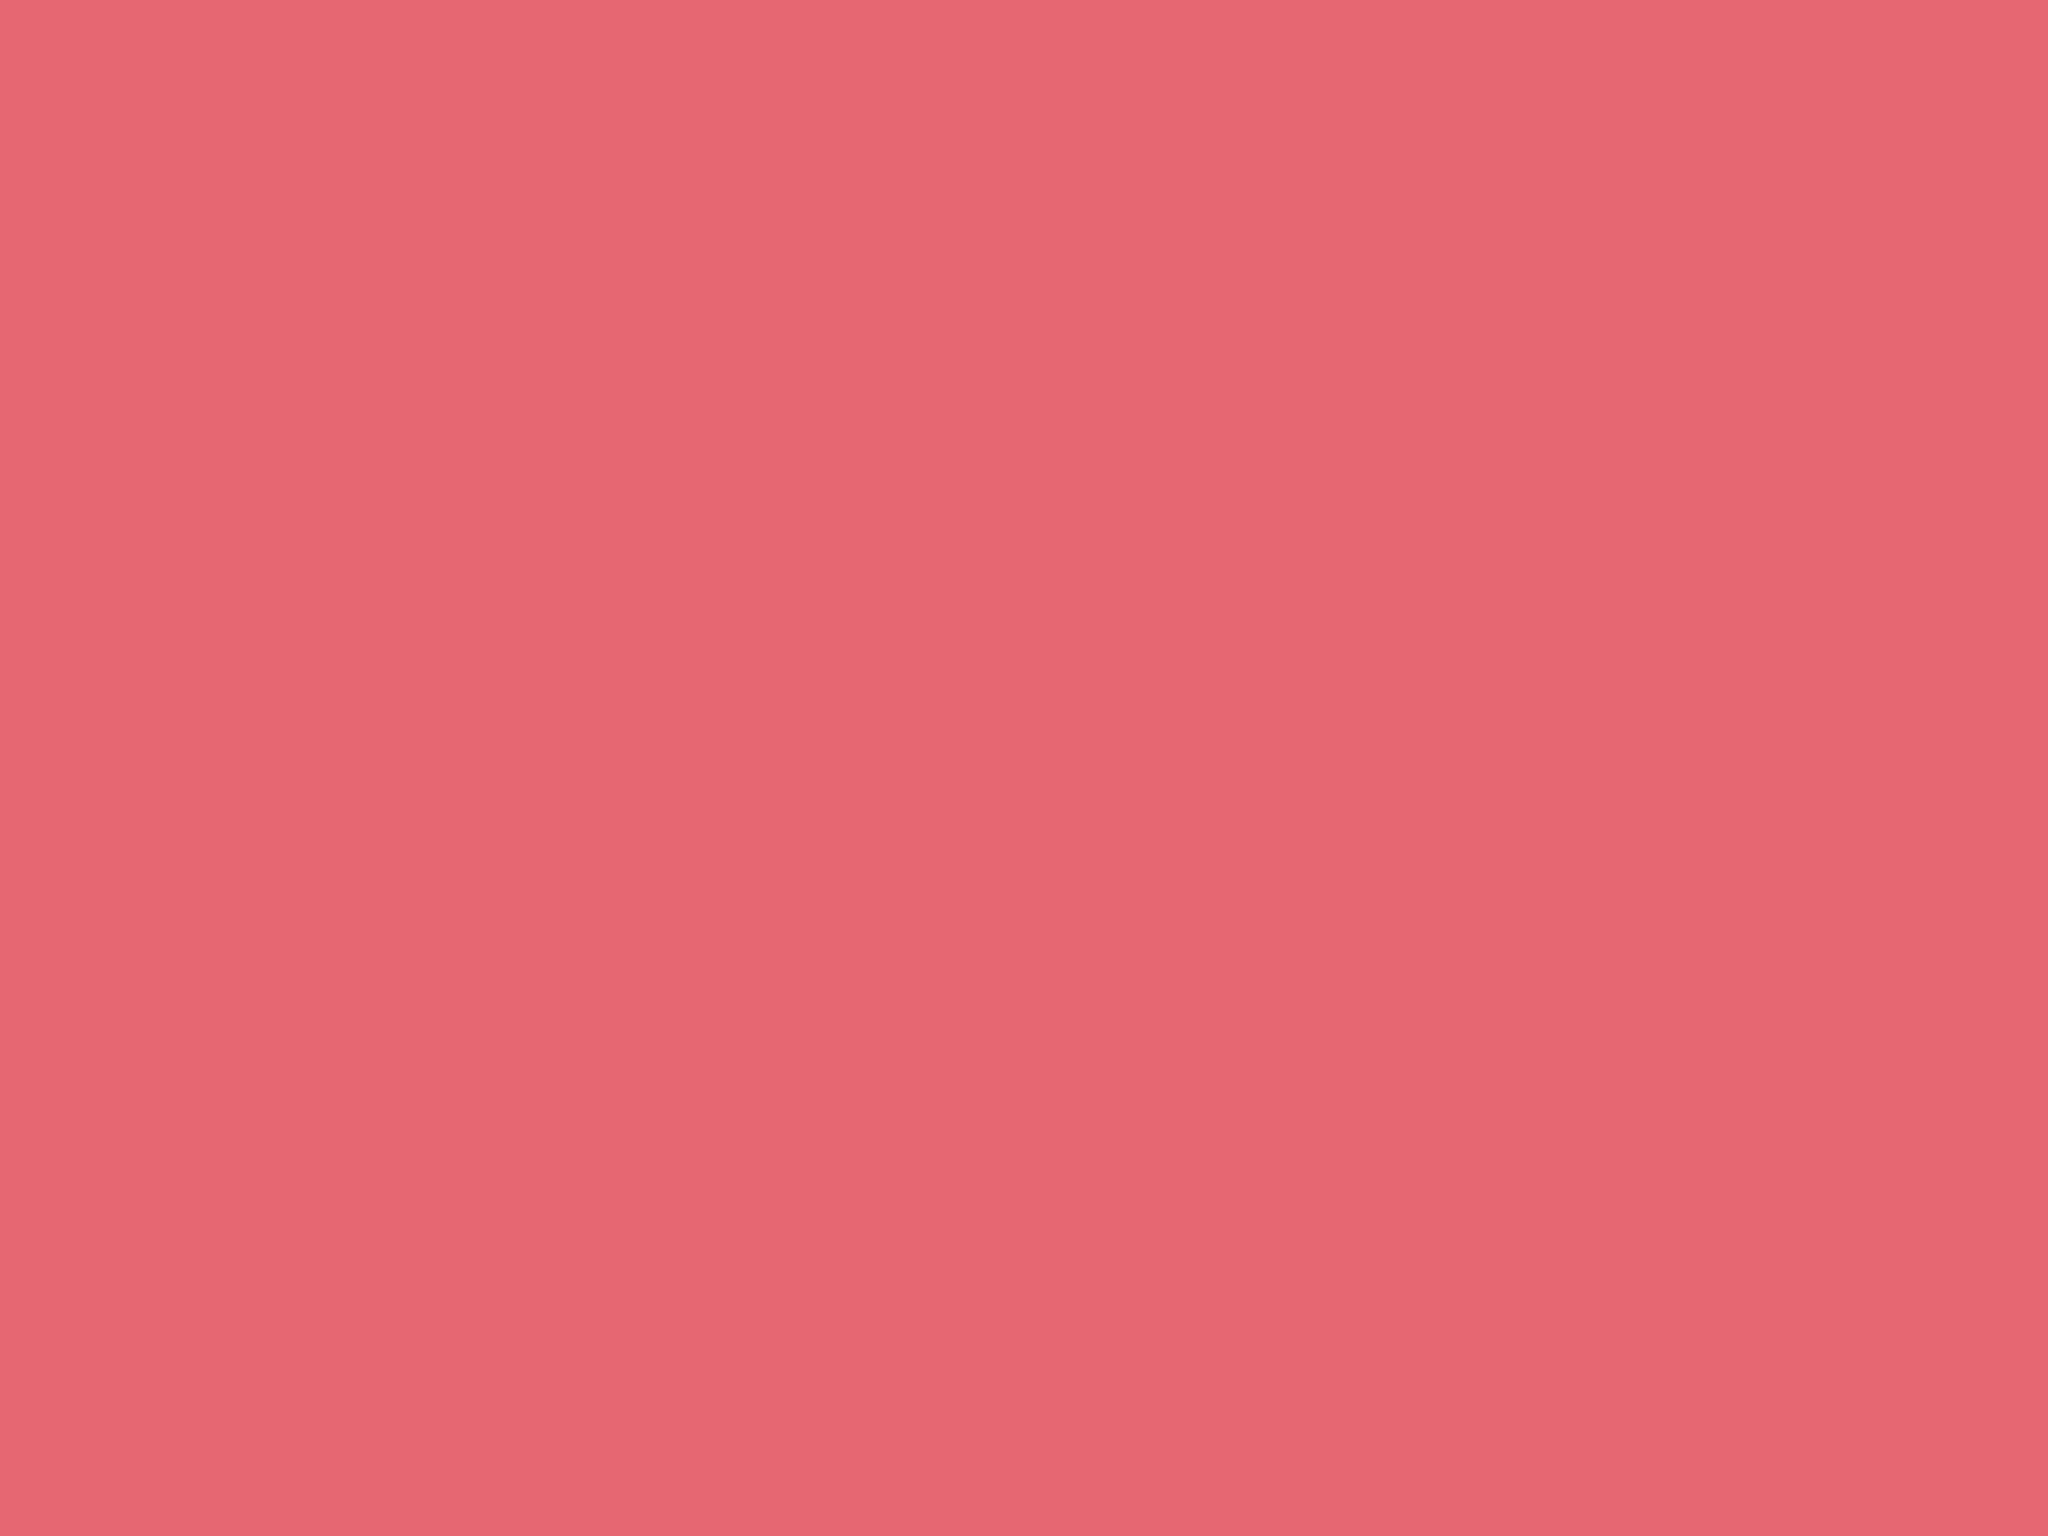 2048x1536 Light Carmine Pink Solid Color Background